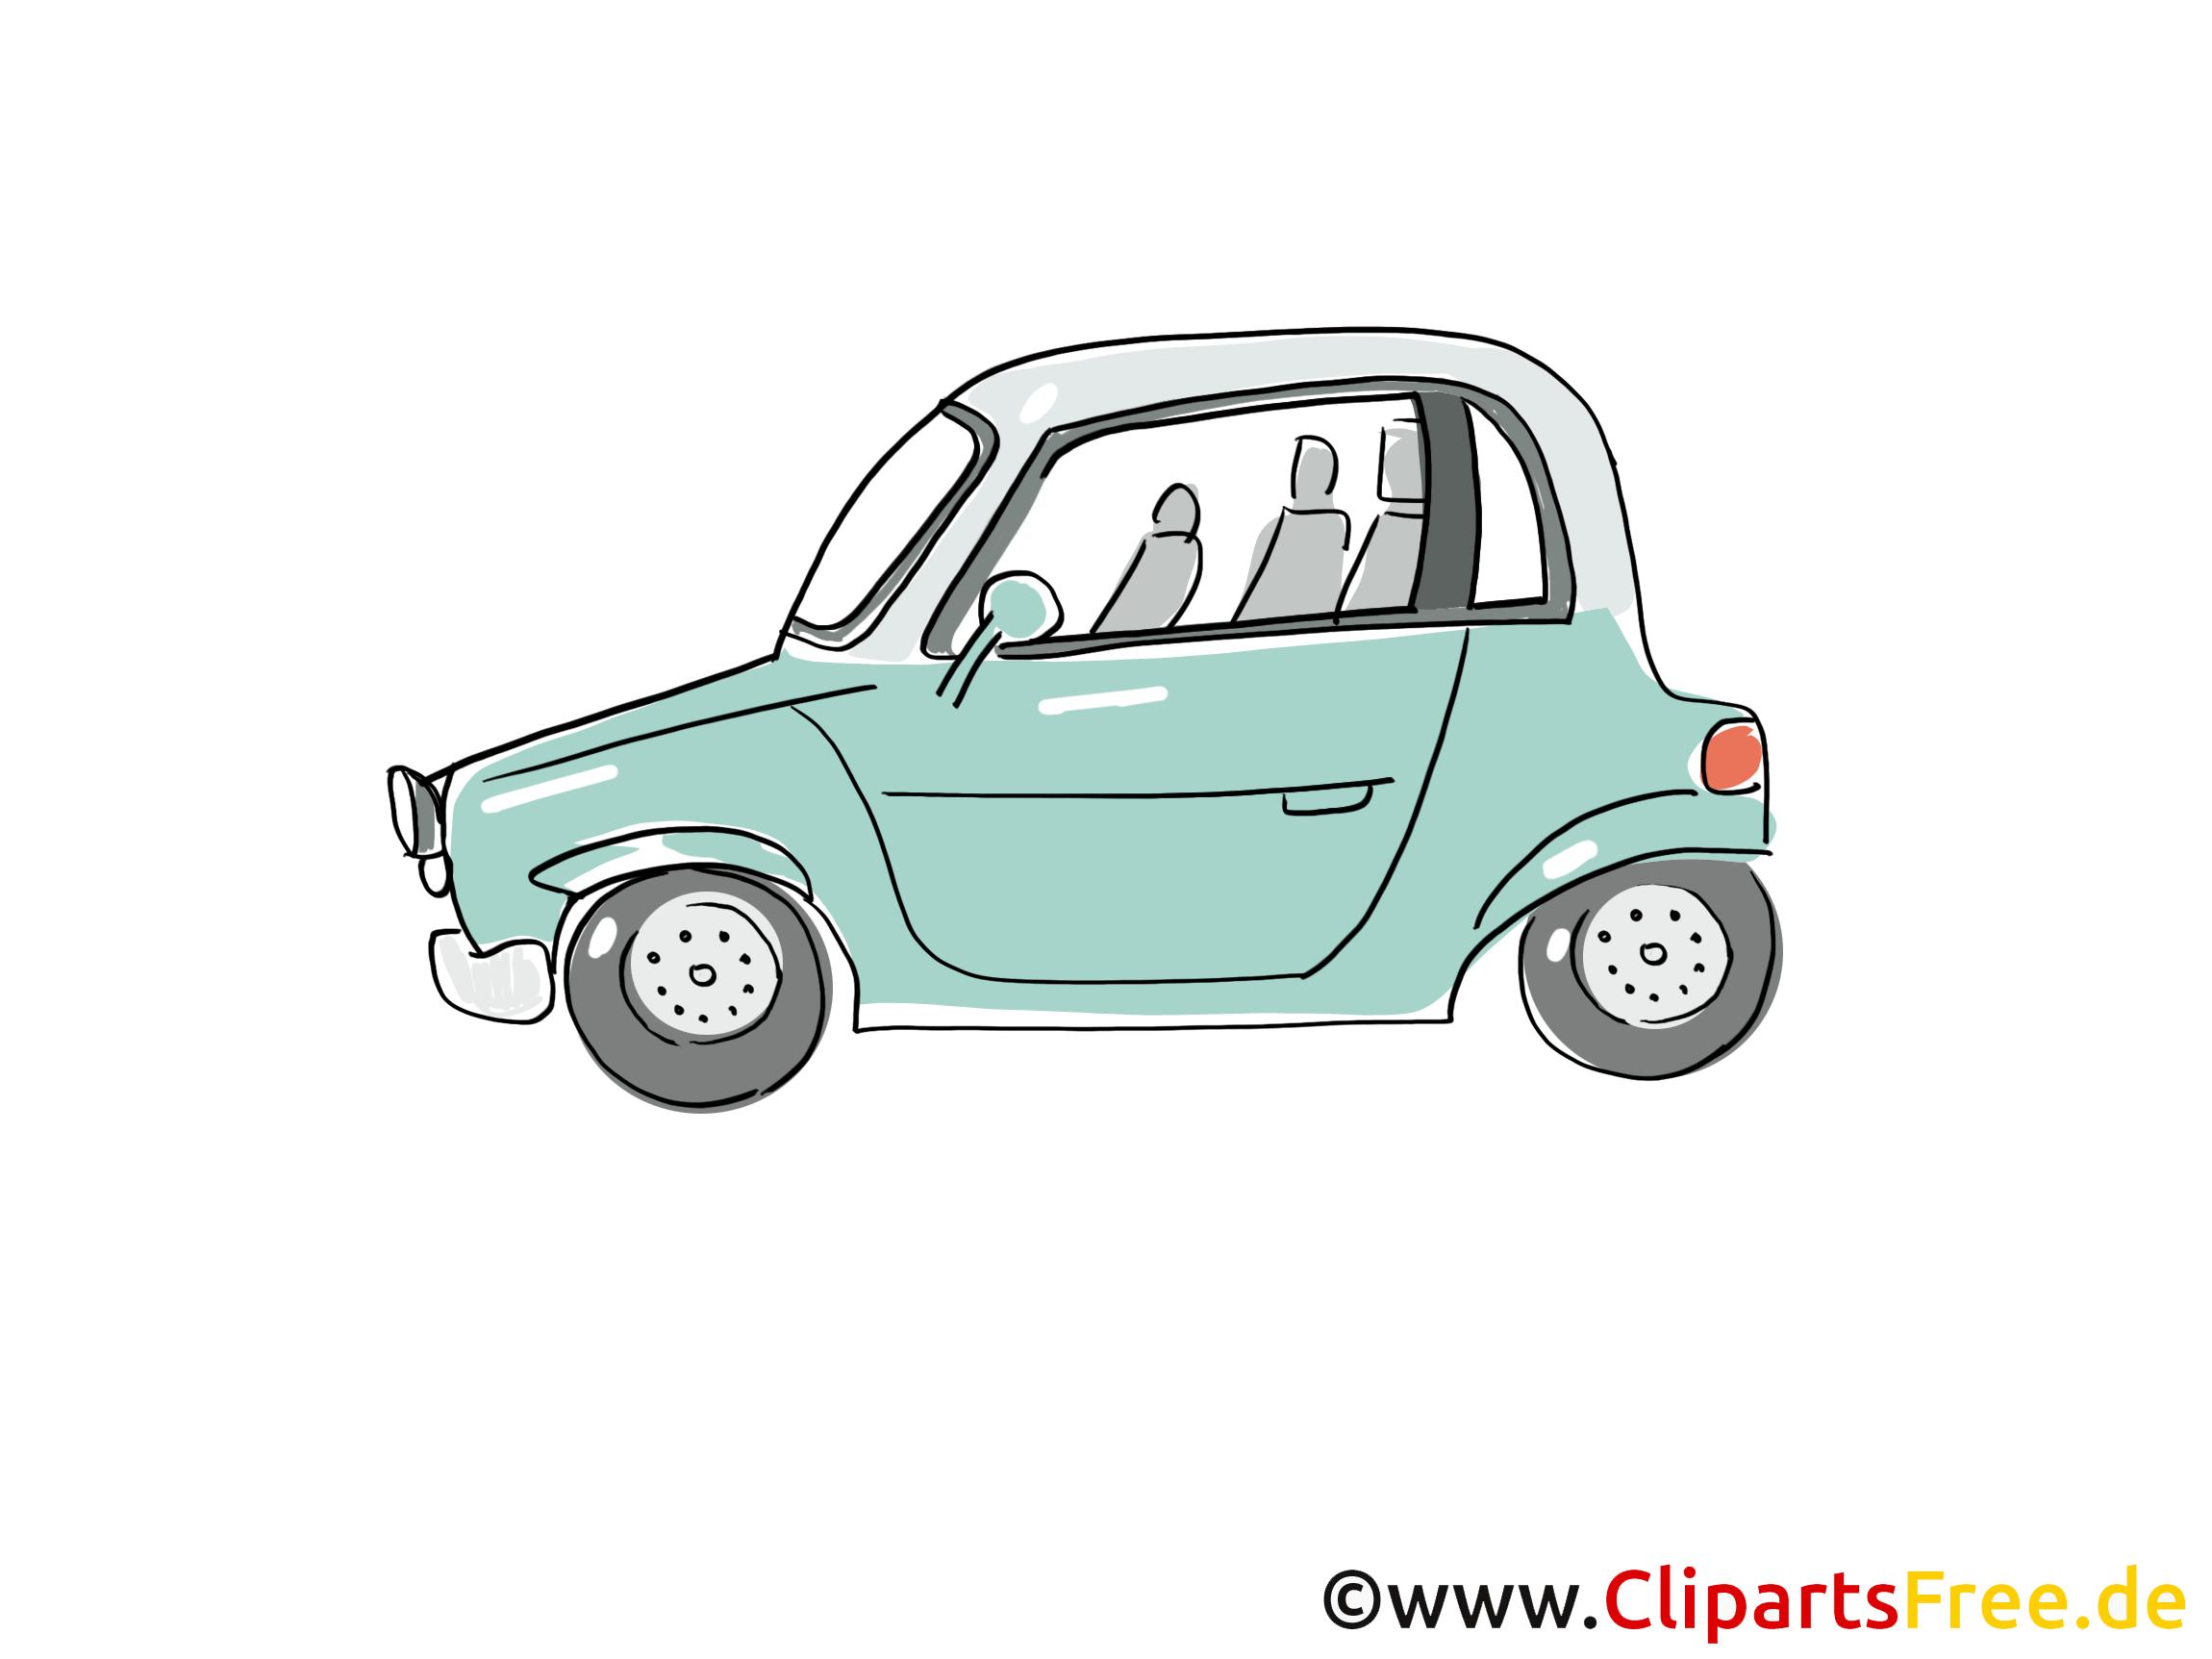 petite voiture dessin cliparts t l charger voitures dessin picture image graphic clip. Black Bedroom Furniture Sets. Home Design Ideas